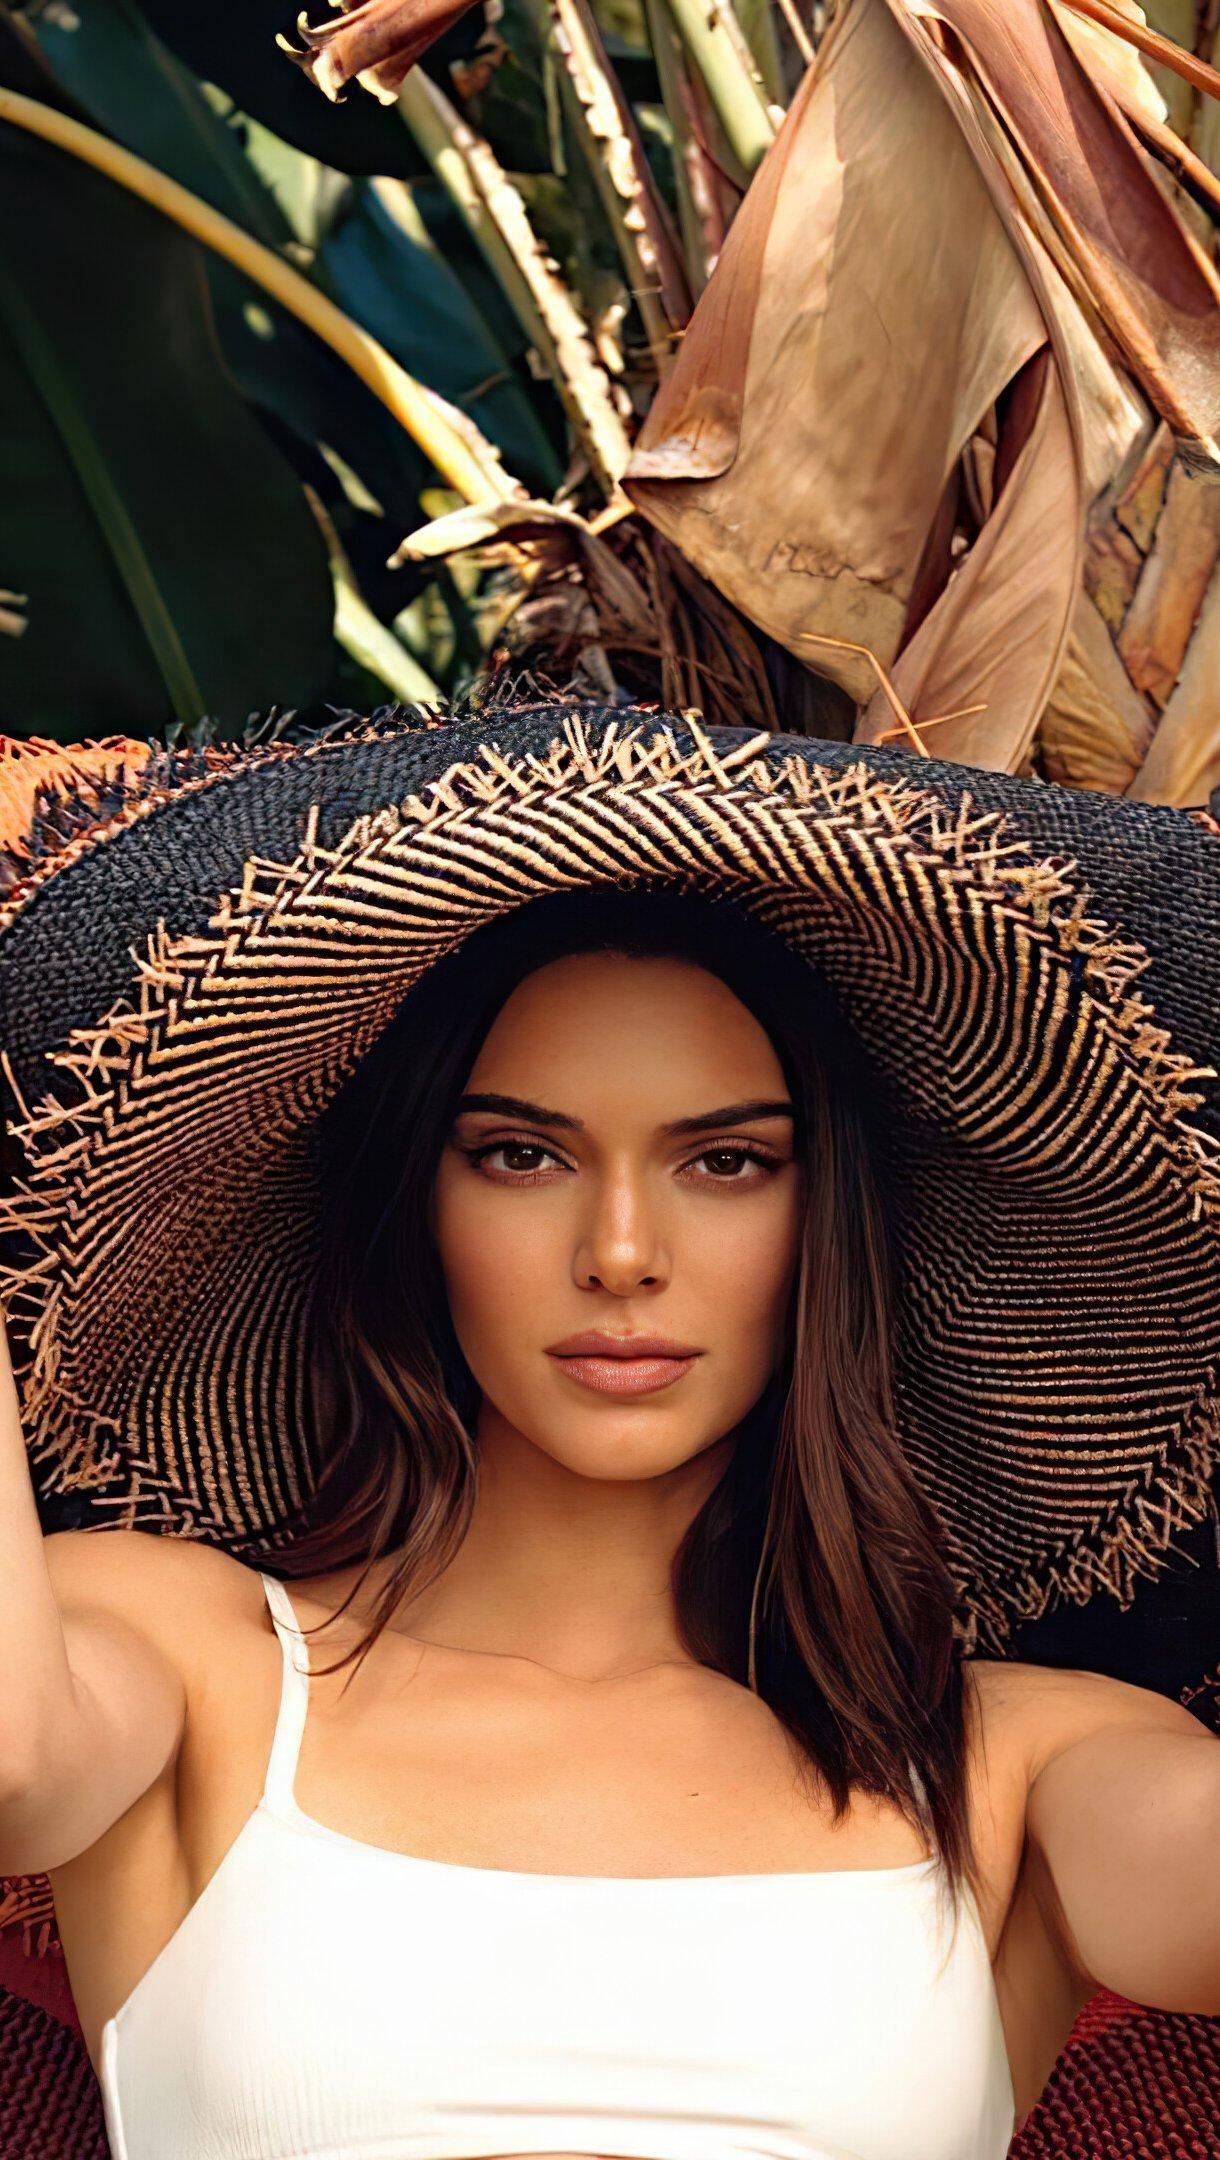 Wallpaper Kendall Jenner in photoshoot Vertical